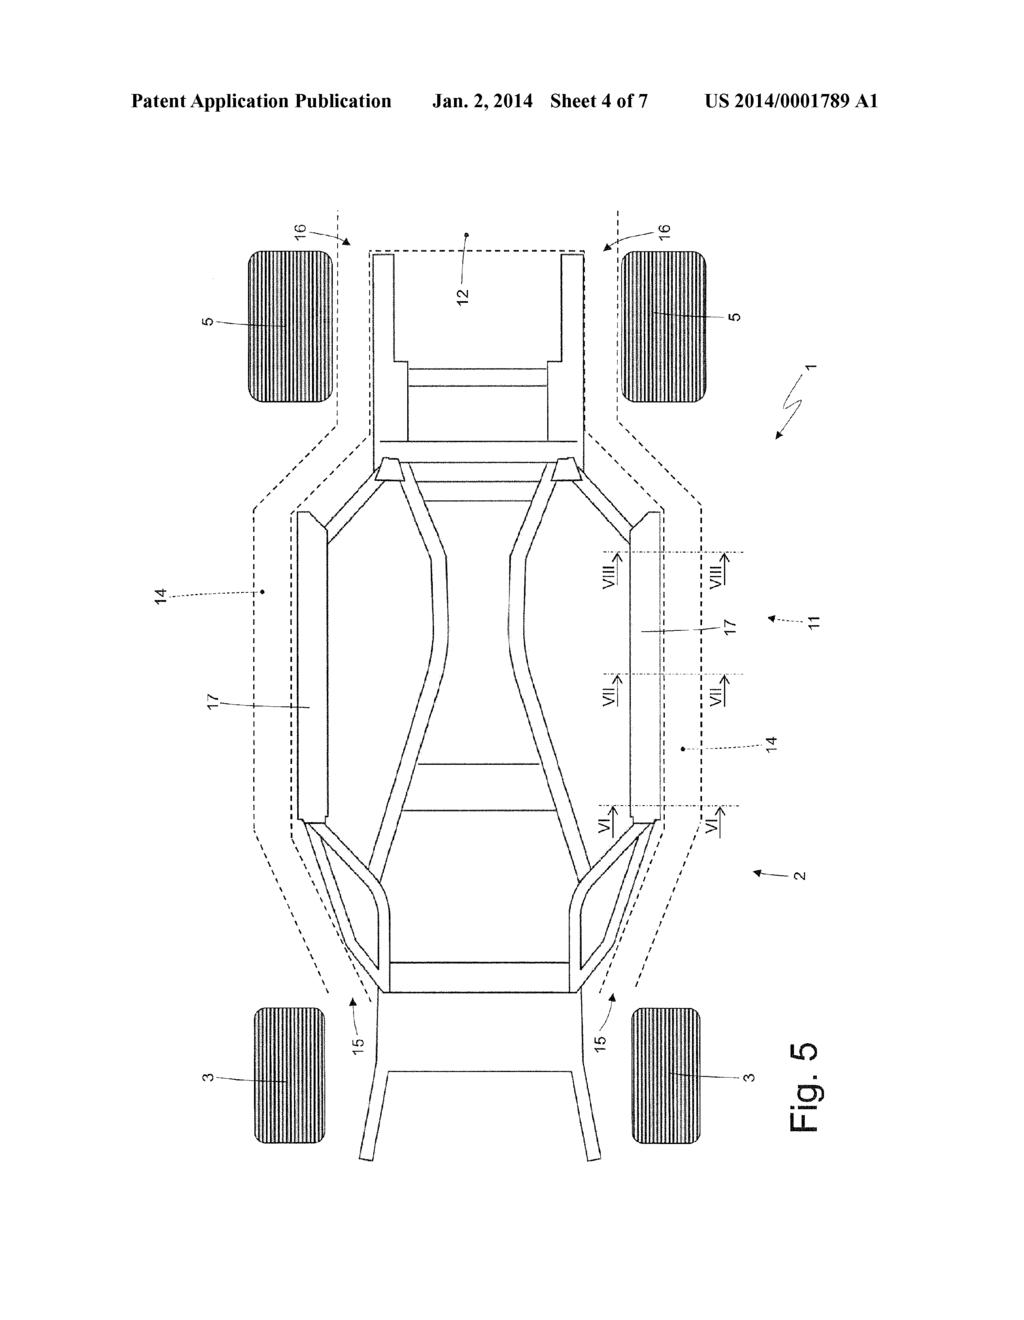 Wiring Diagram For Infiniti Qx60. Infiniti. Auto Wiring